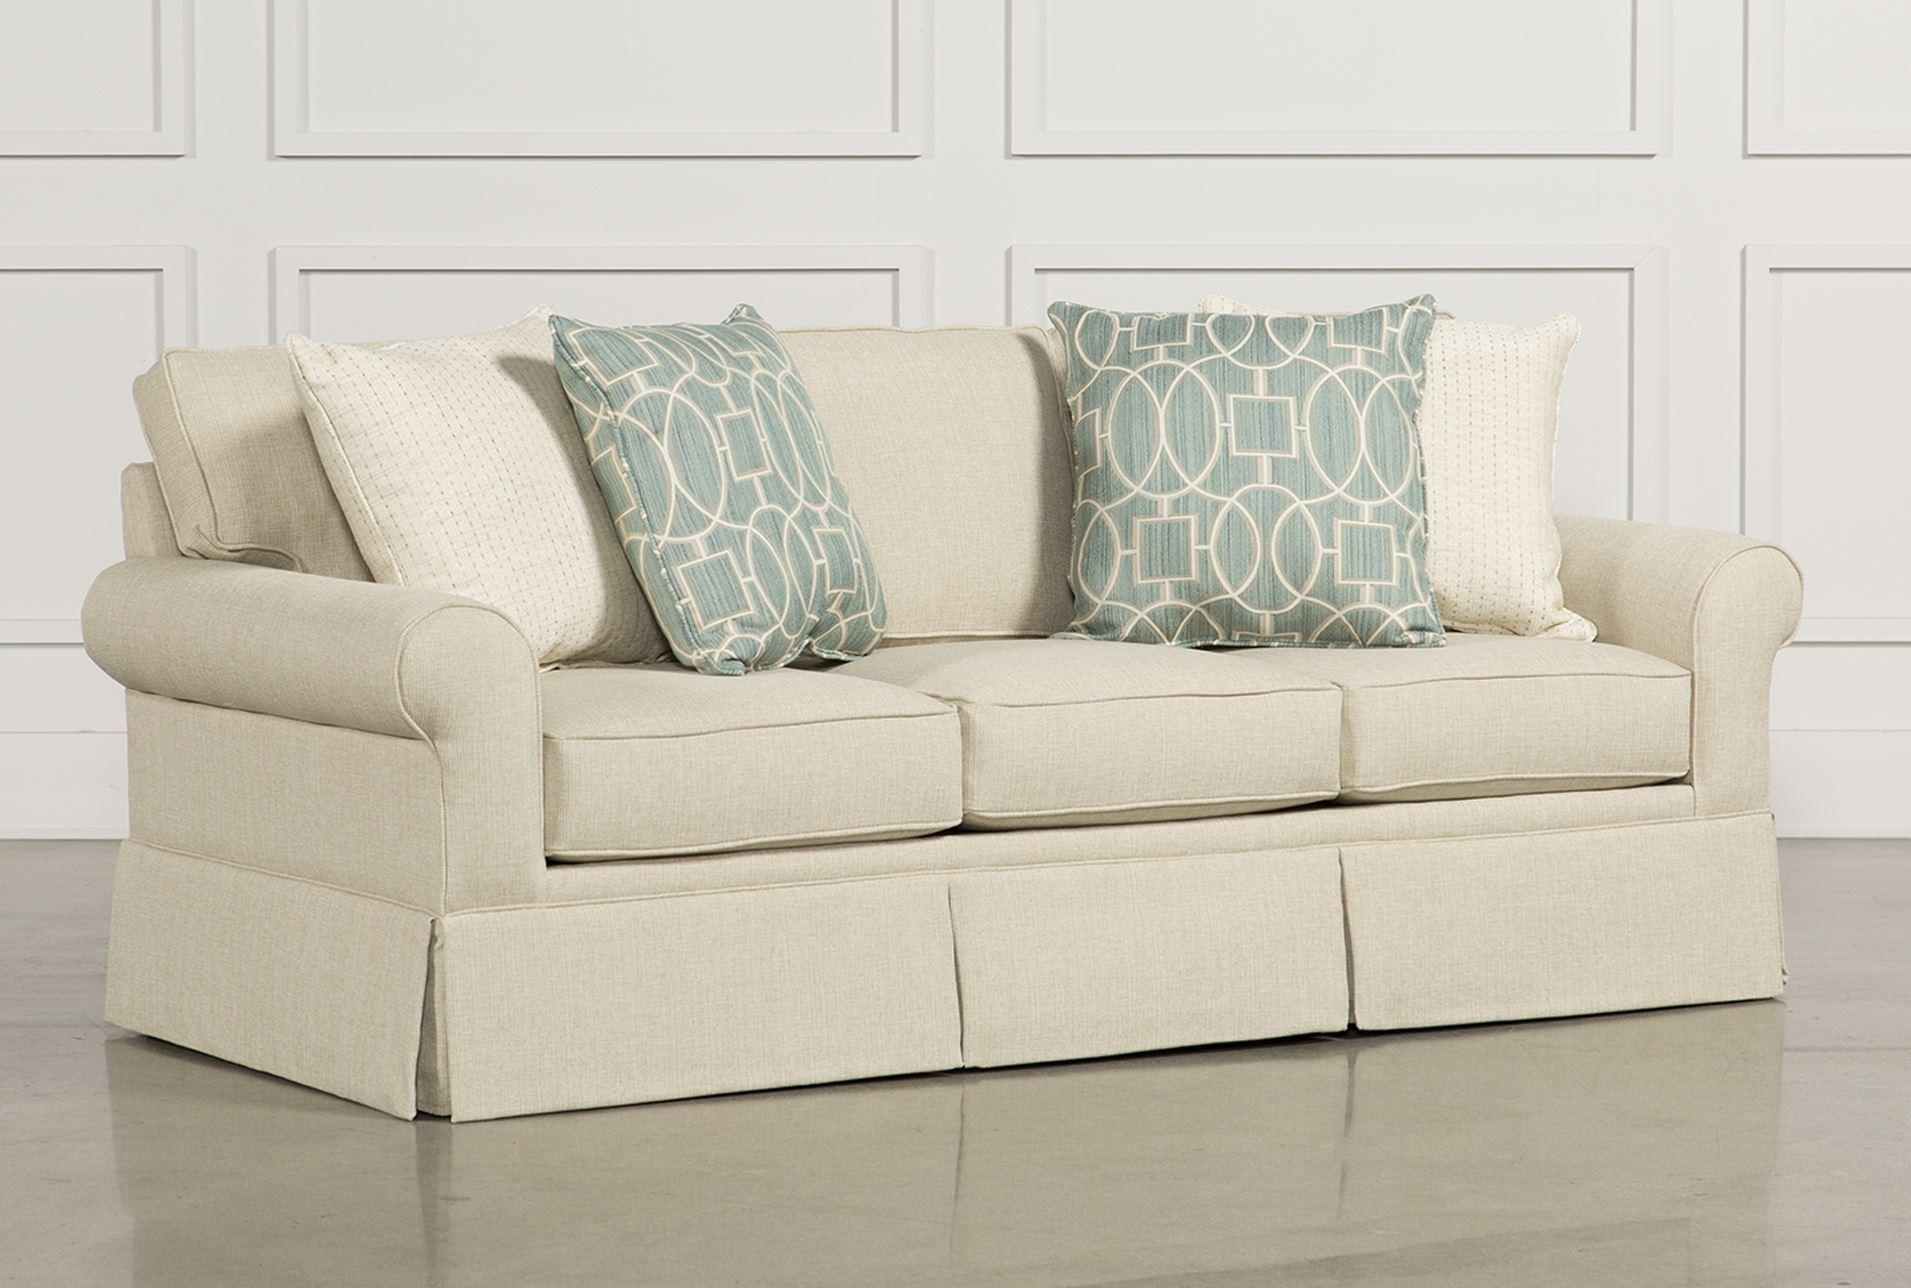 Fresh White Fabric Sofa 31 On Modern Sofa Ideas With White Fabric Sofa Within White Fabric Sofas (View 14 of 20)